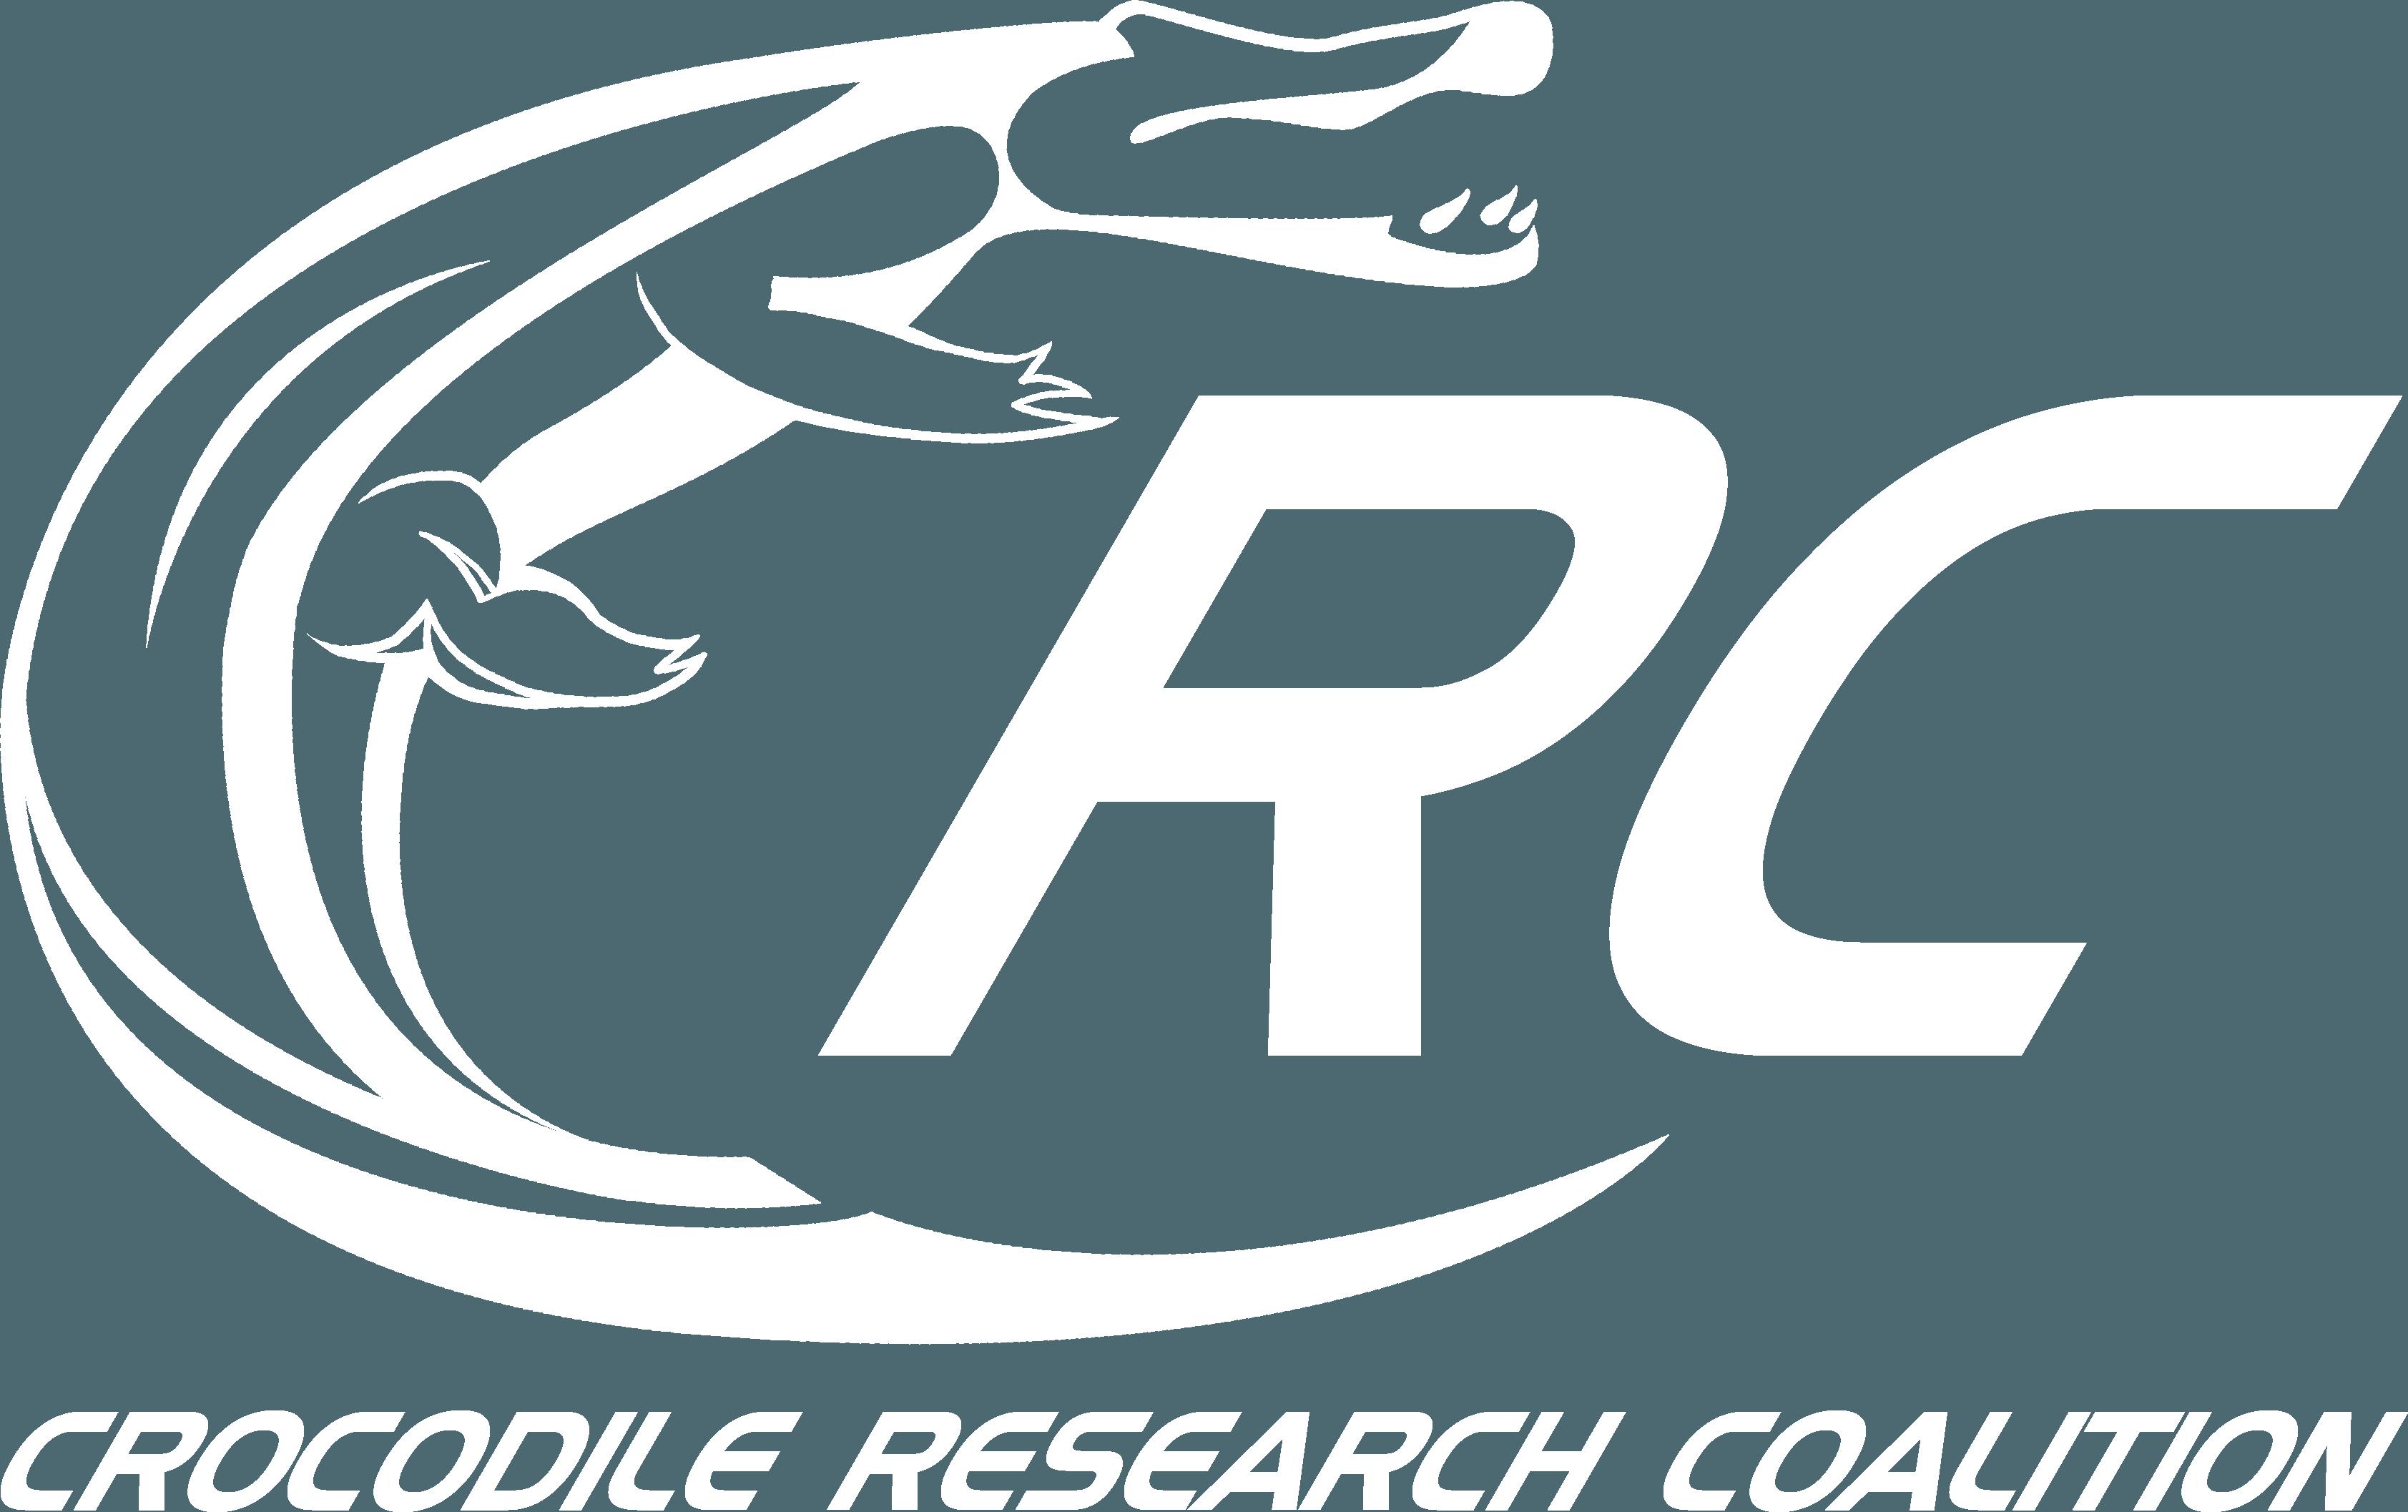 crocodile-research-coalition-logo